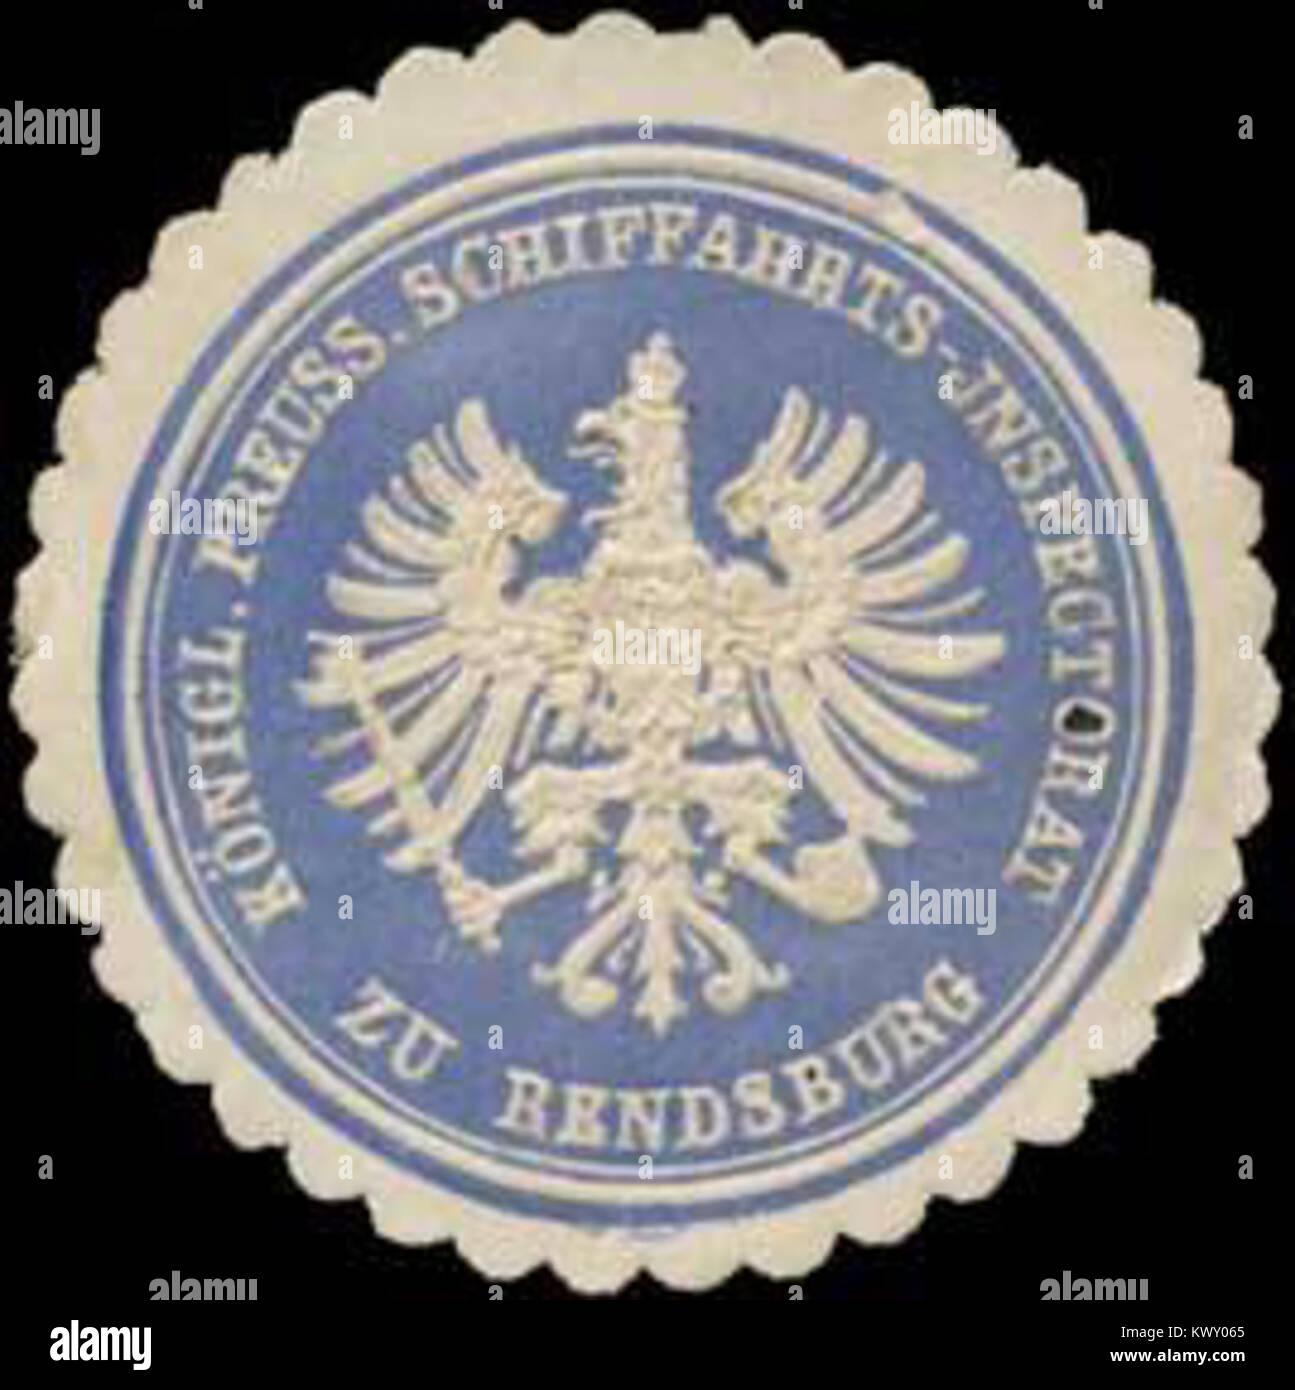 Siegelmarke Königl. Preuss. Schiffahrts-Inspectorat zu Rendsburg W0325860 Stock Photo